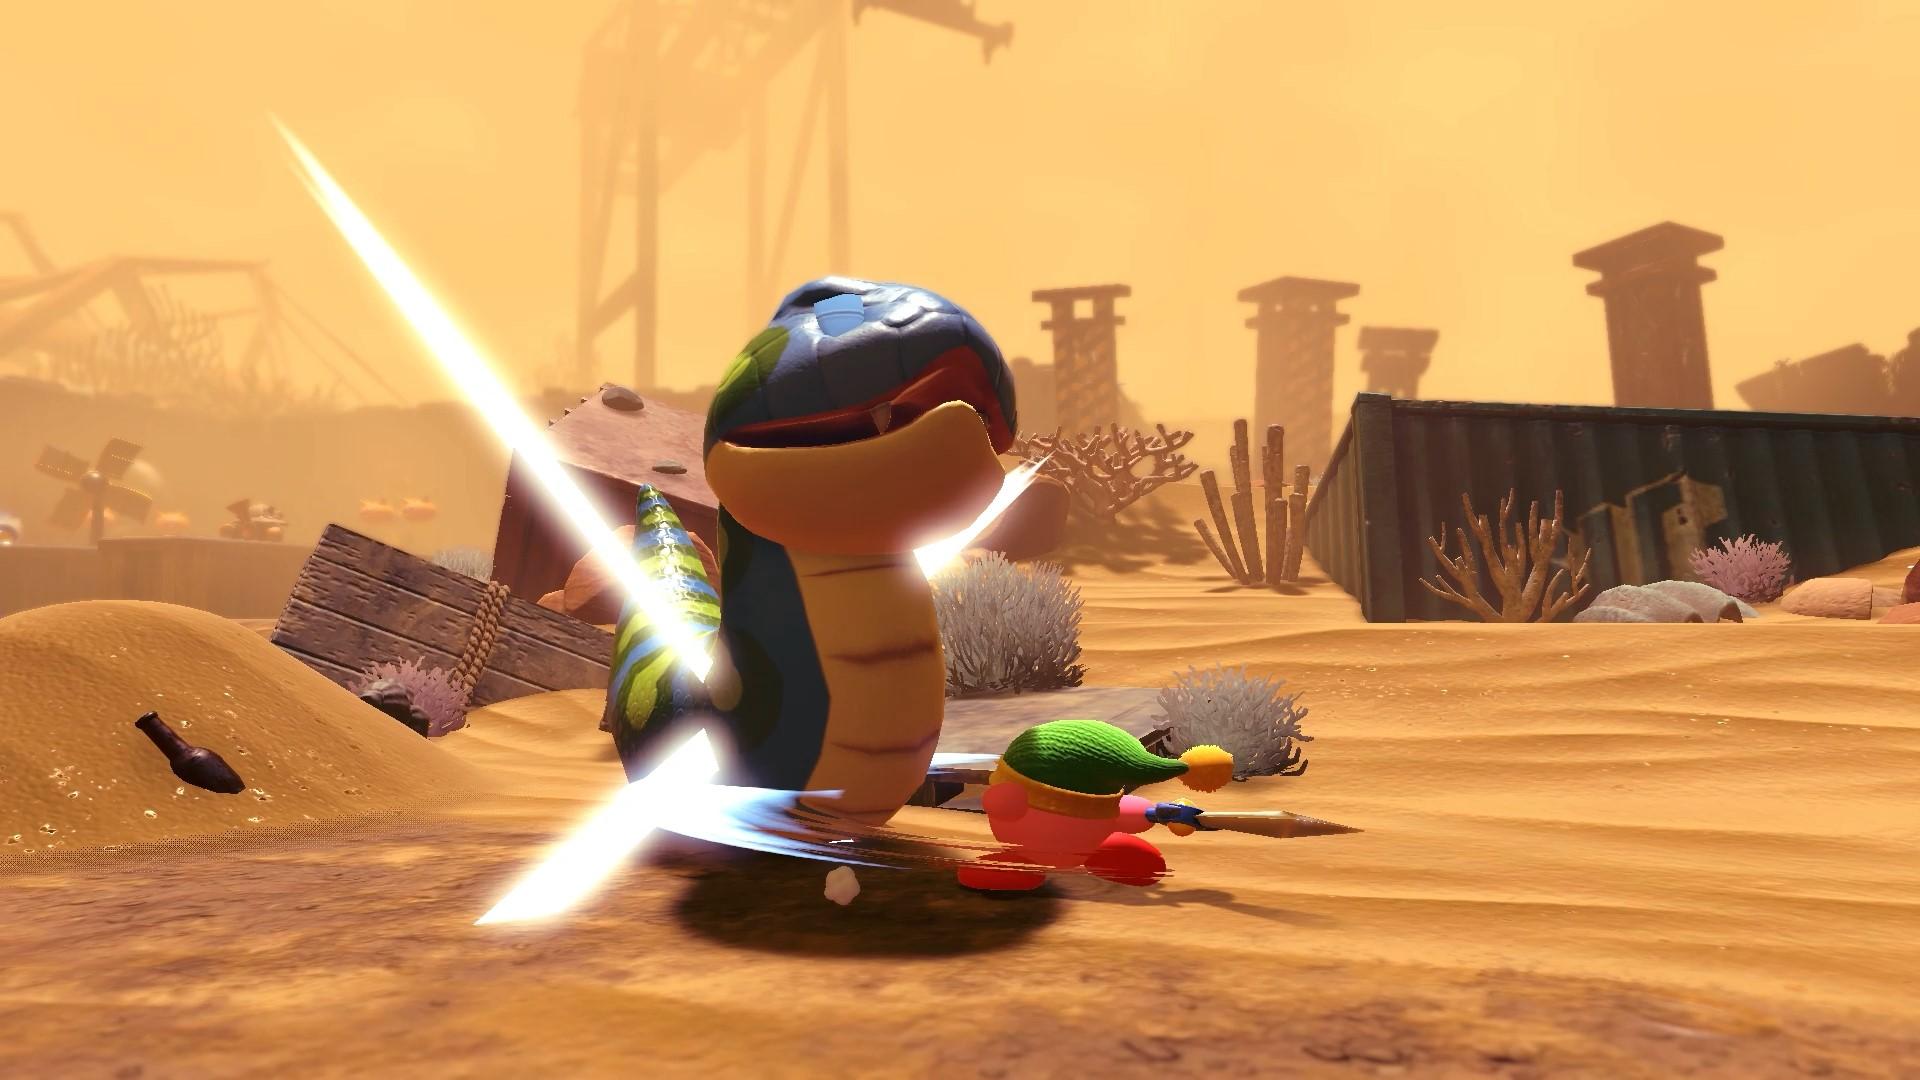 NintendoSwitch_Kirby_scrn09.jpg